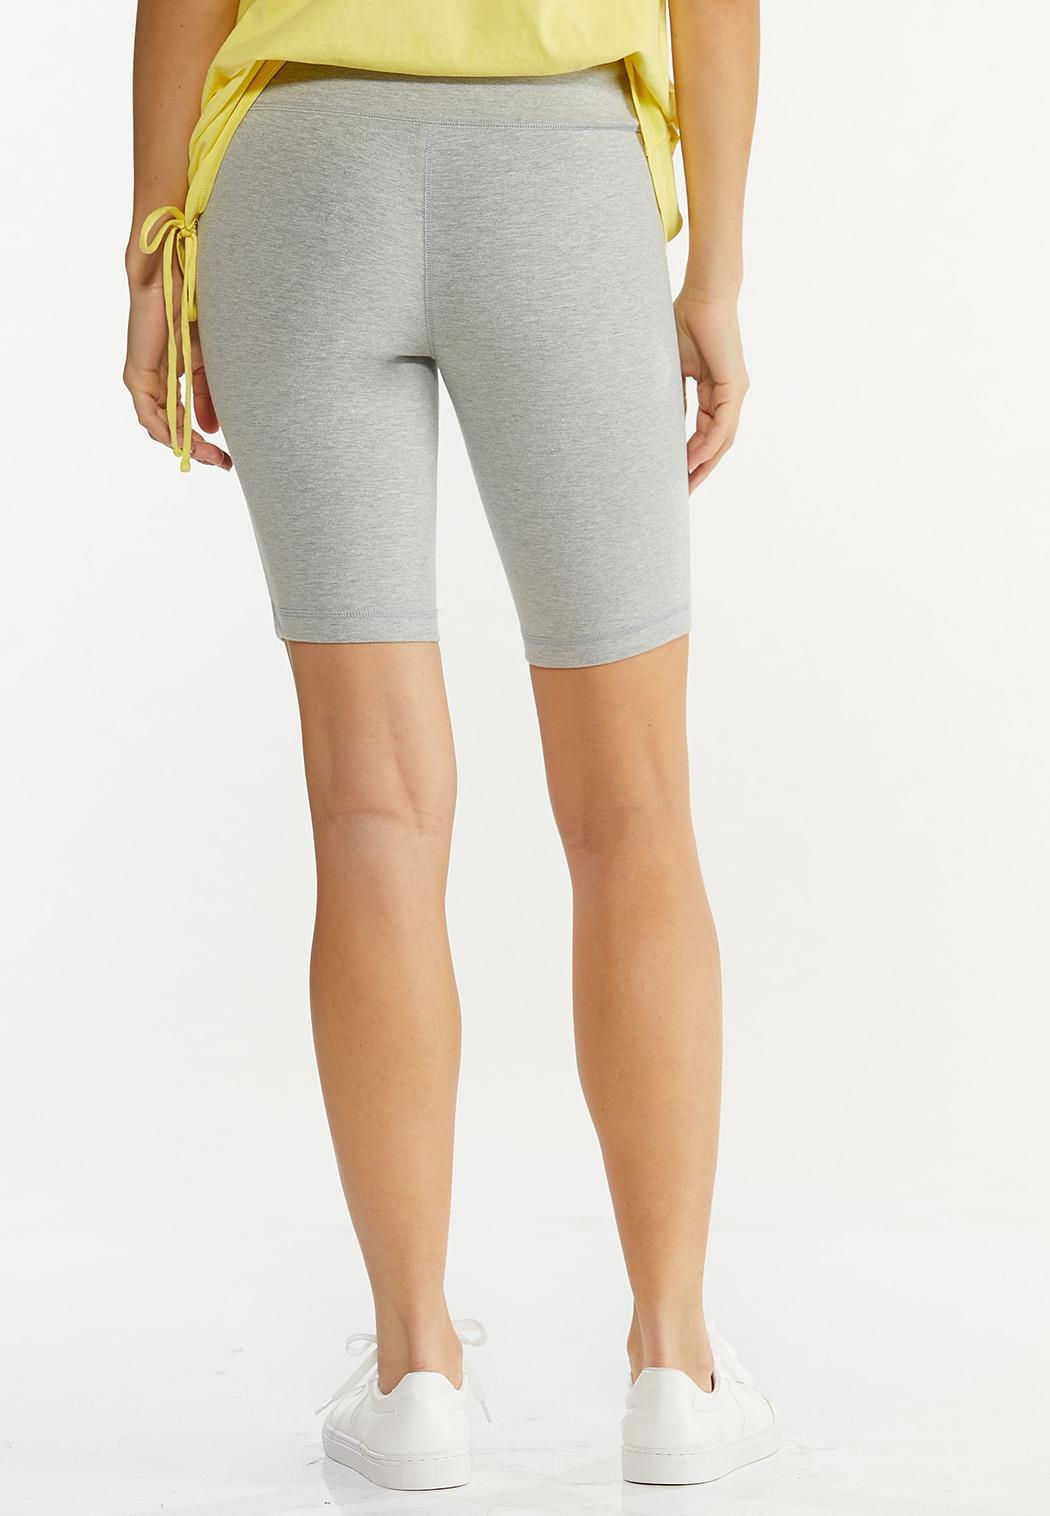 Heather Gray Biker Shorts (Item #44578656)